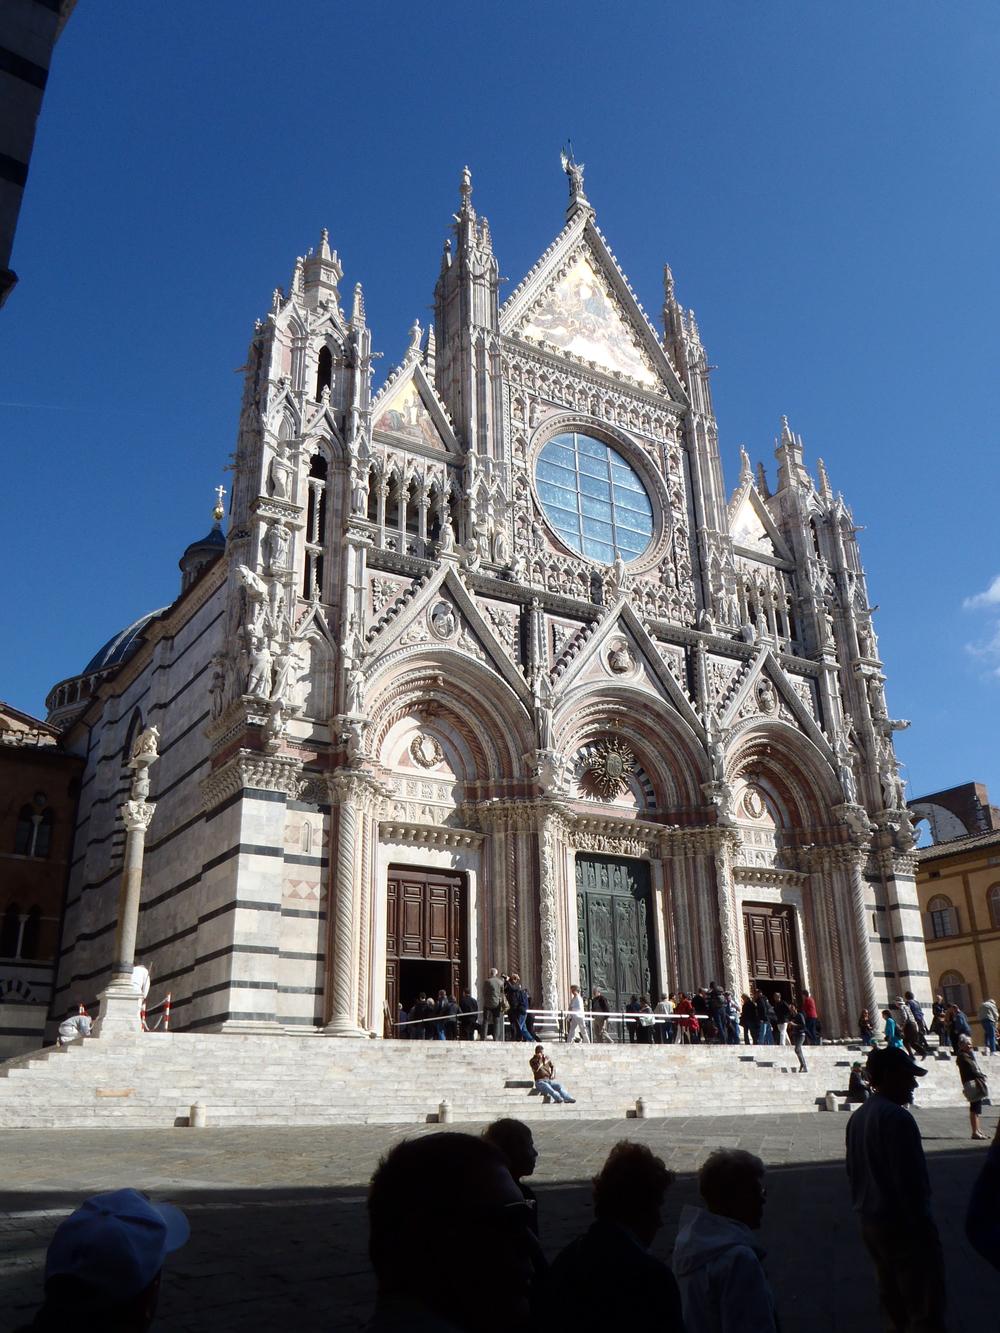 CRO Italy web 2010 - 05.jpg